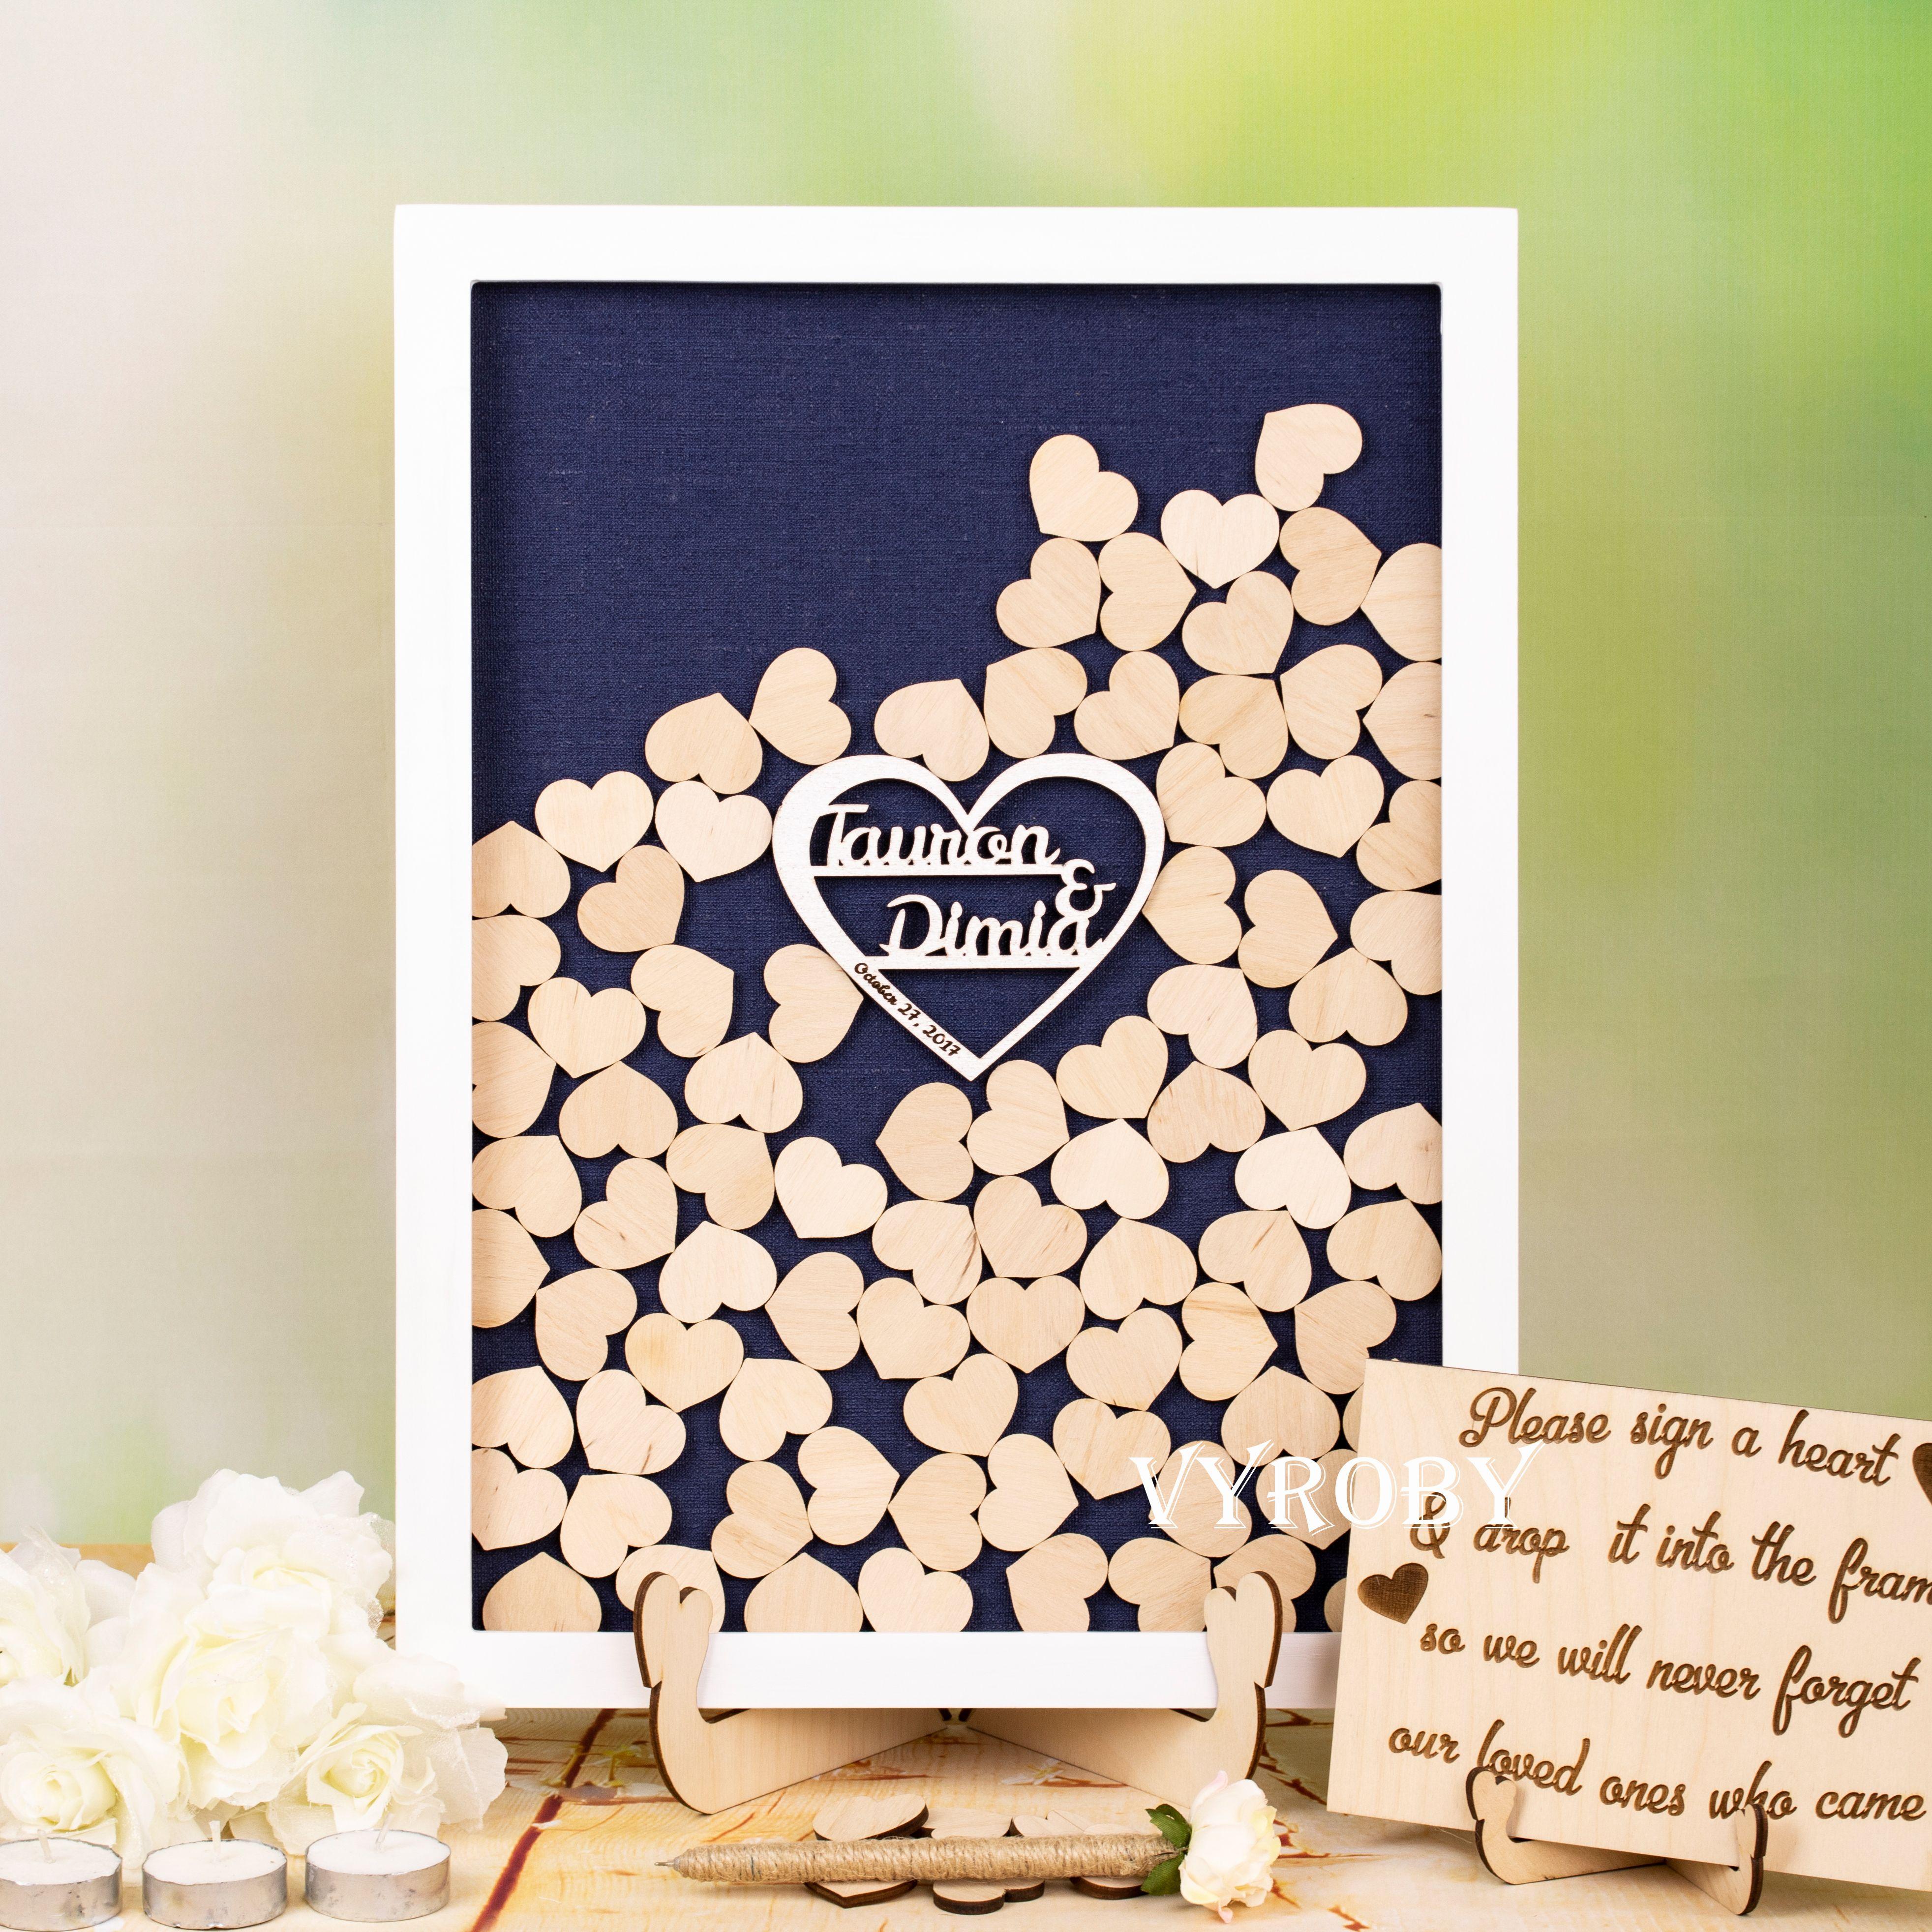 Wedding Memory Book Ideas: Guest Book Alternative Ideas Drop Box Wedding Guest Book